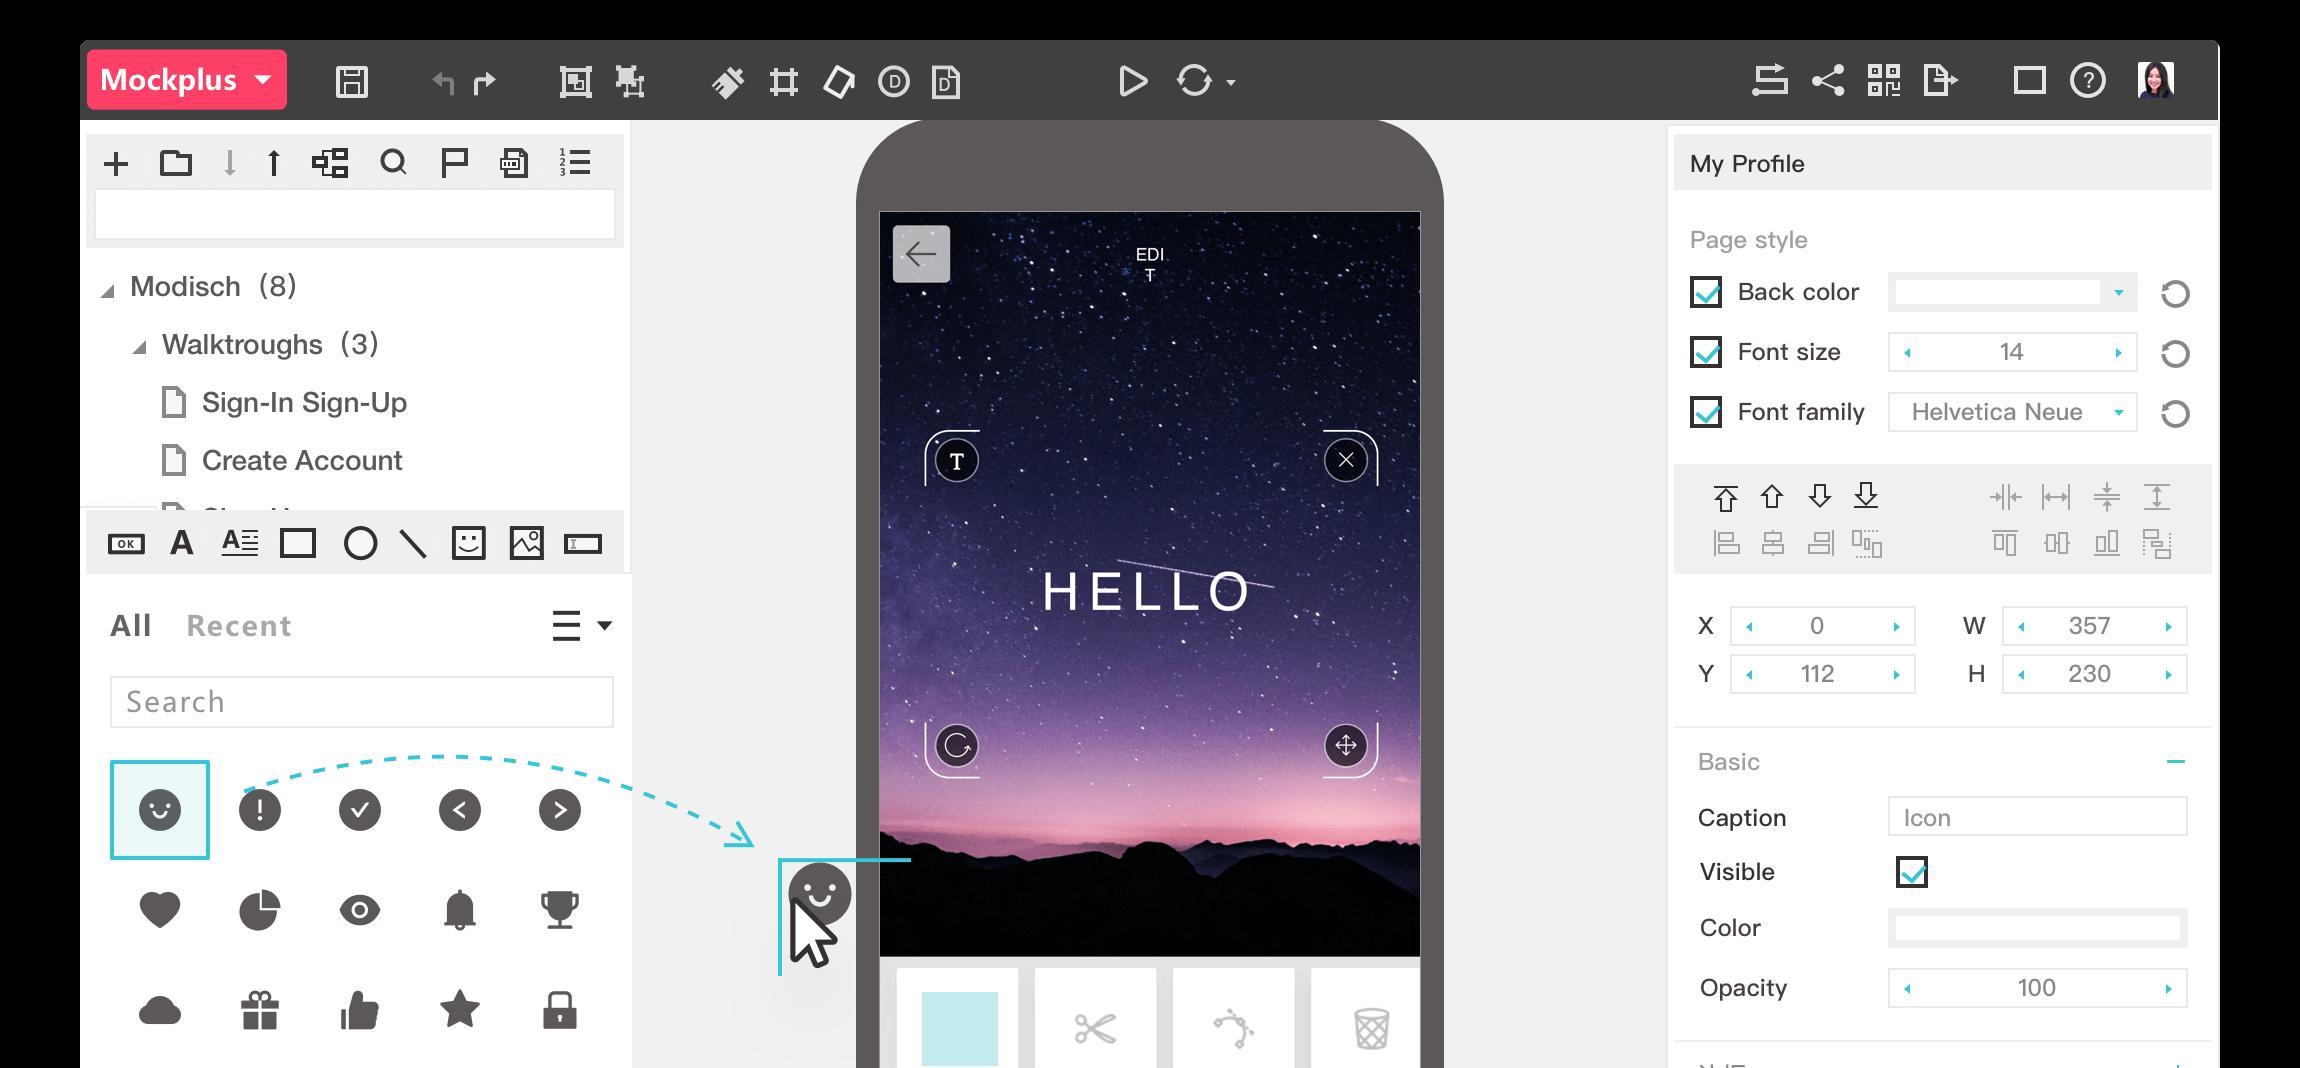 Mockplus drag-and-drop option screenshot